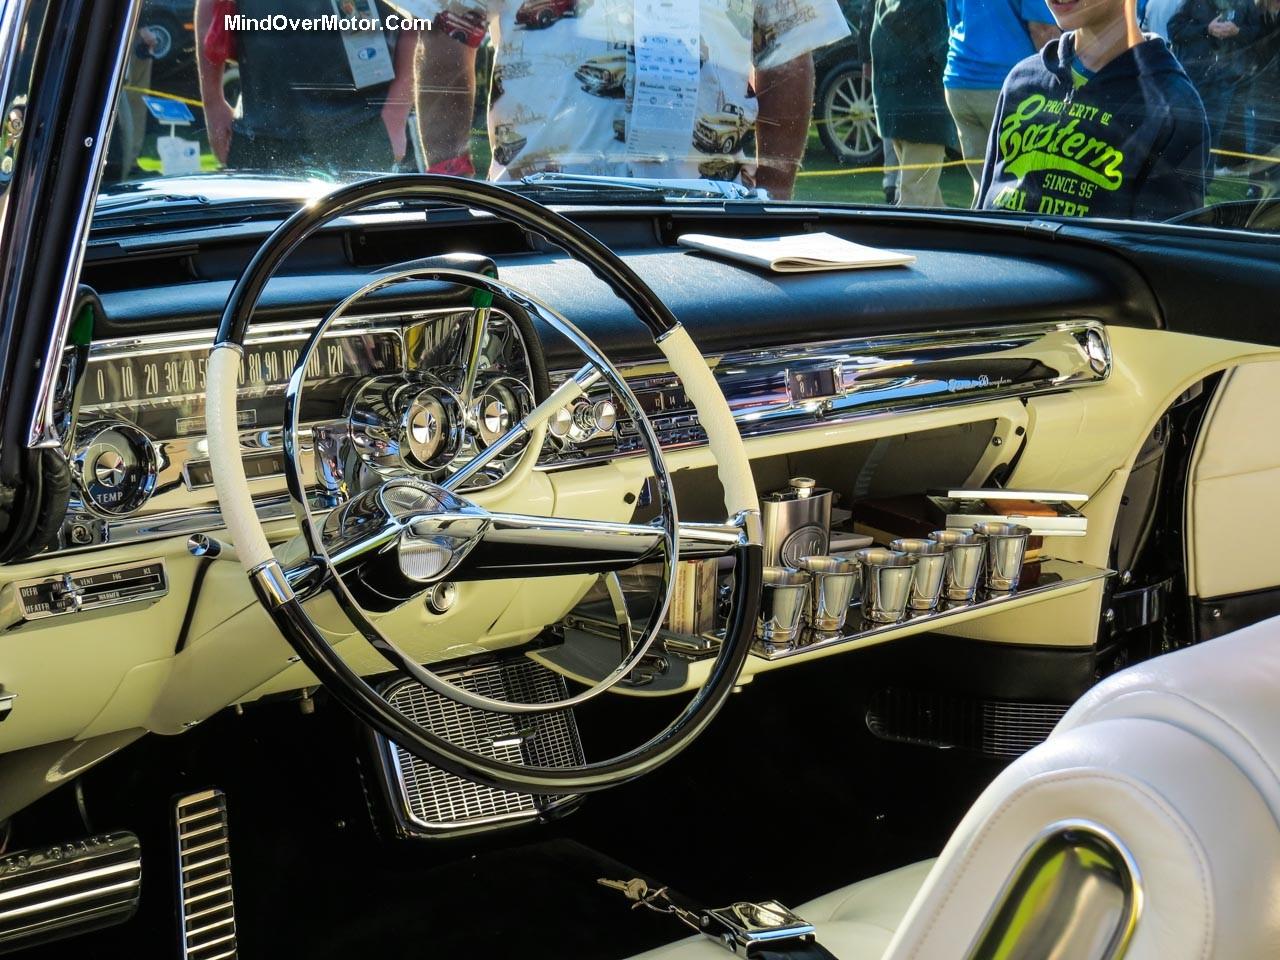 1957 Cadillac Eldorado Brougham At The Amelia Island Concours D Elegance Mind Over Motor